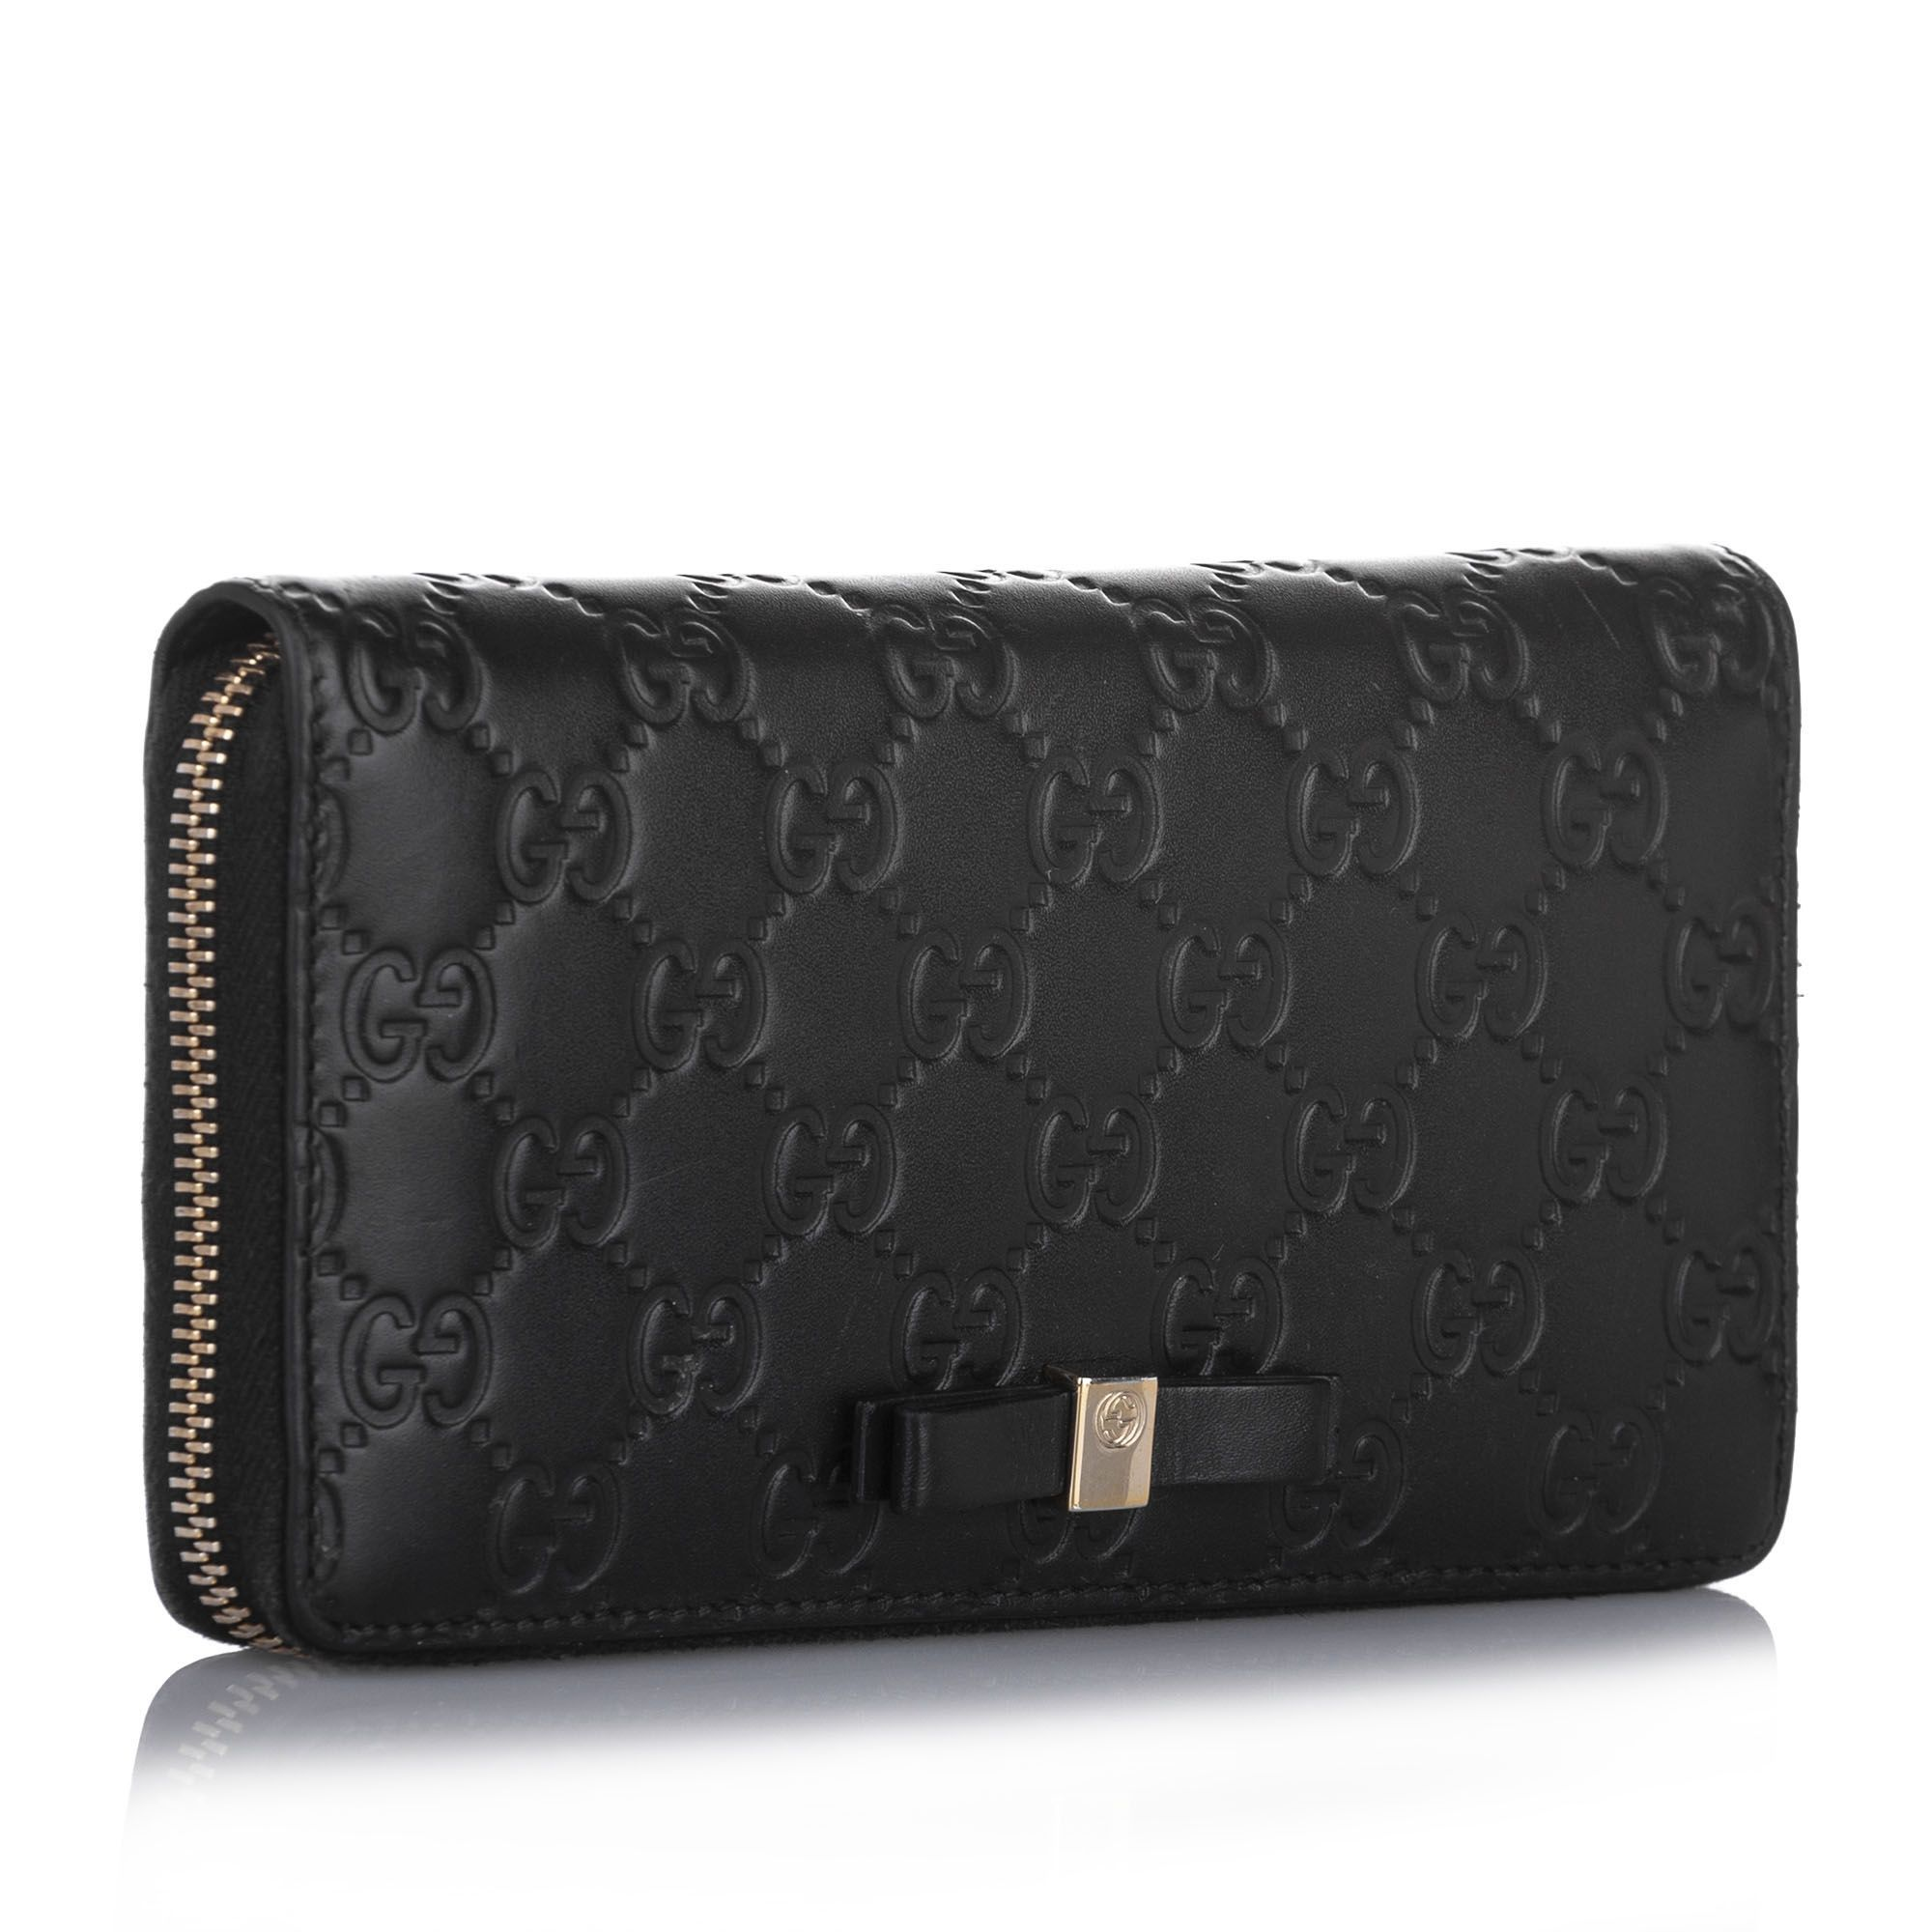 Vintage Gucci Guccissima Zip Around Long Wallet Black